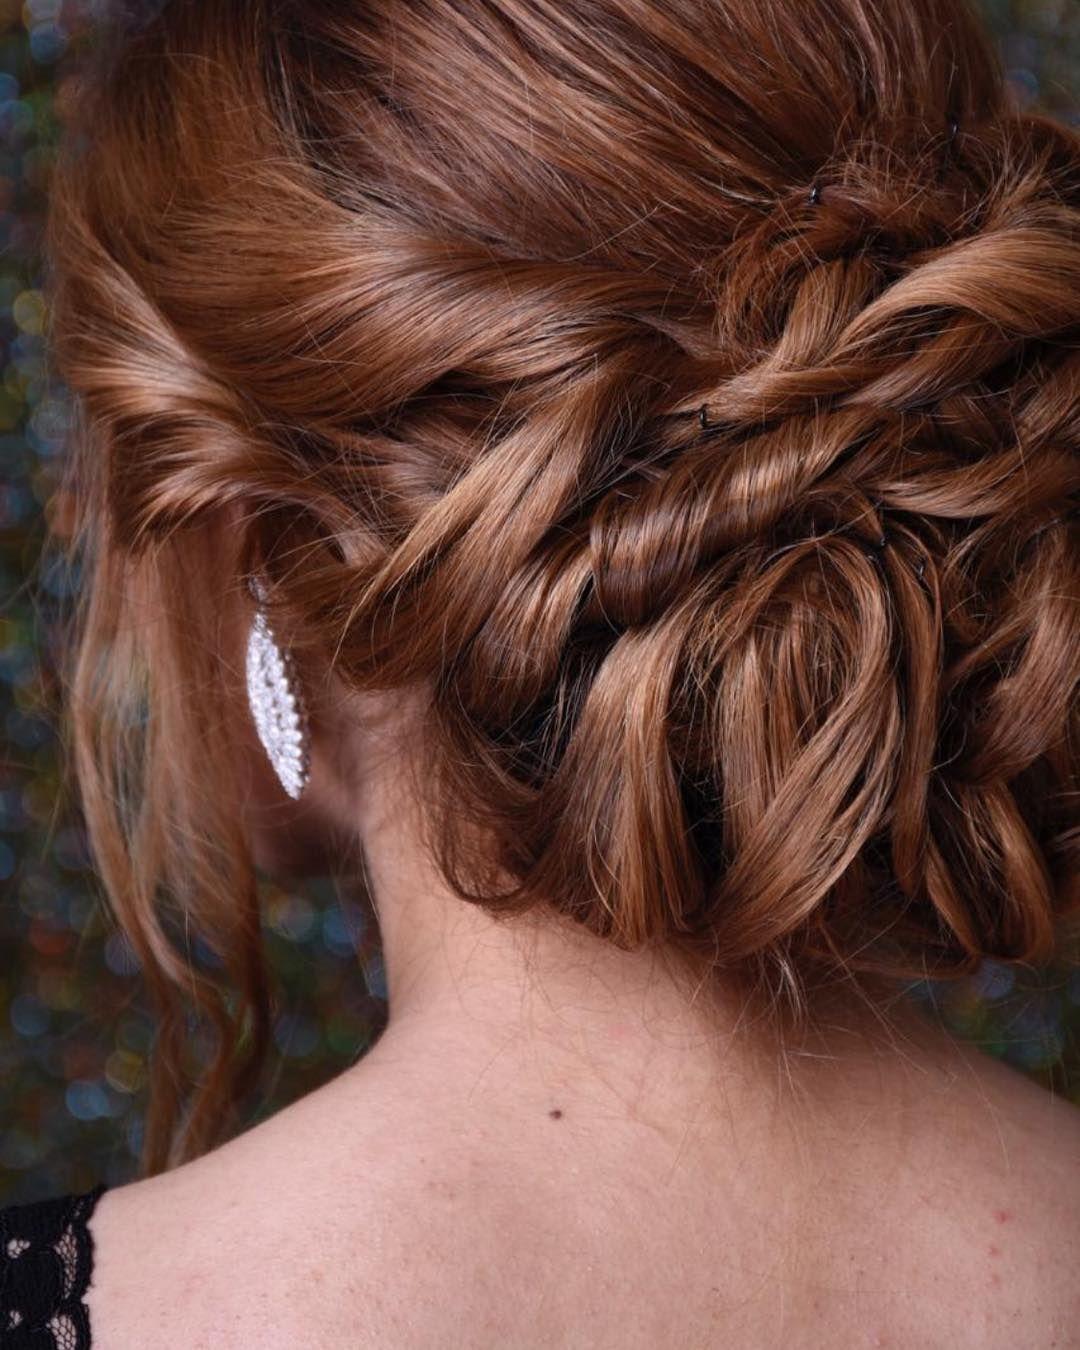 New The 10 Best Hairstyles With Pictures تساريح عرايس تساريح تساريح جديده تساريح عرايس موضة فاشن ازياء تسريحات اناقة موضة شعر Hair Styles Hair Style